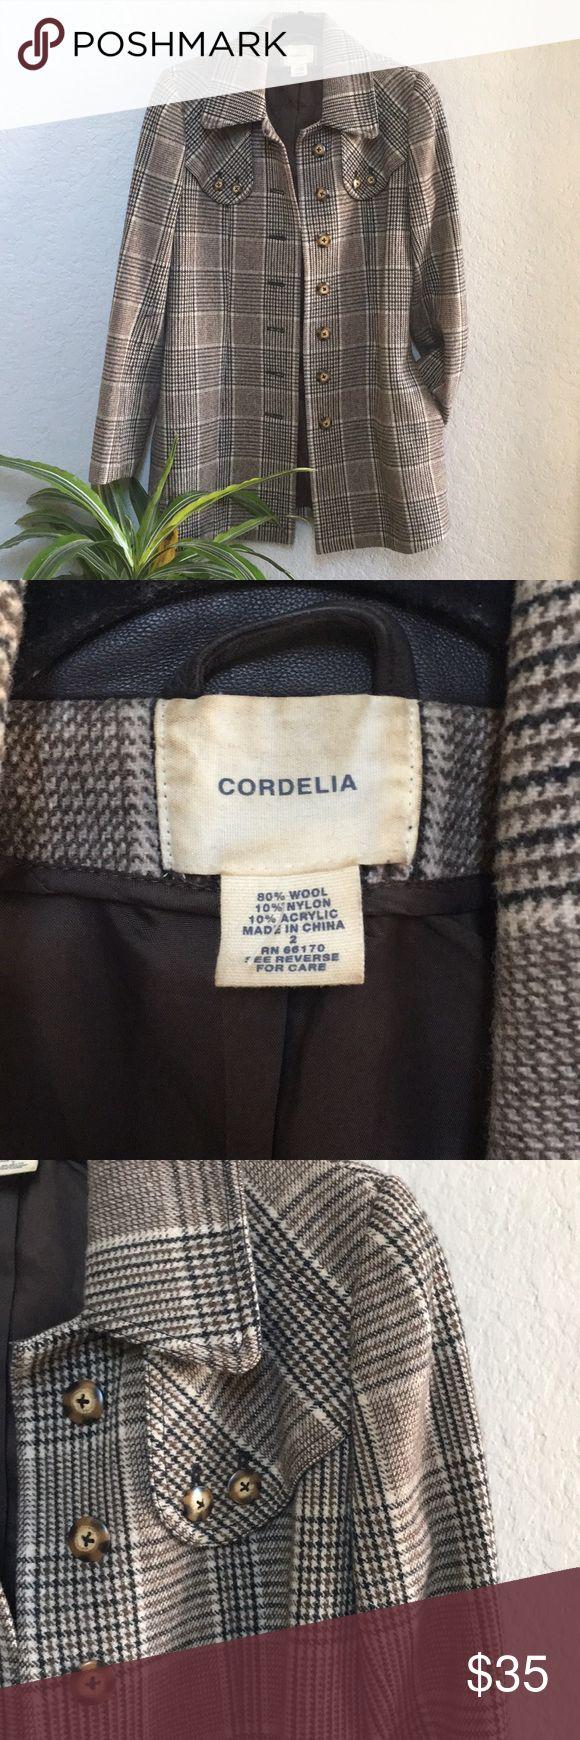 SYDNEY PEACOAT Herringbone coat 2 side pocket Cozy as heck Fits adorable Tortoise color buttons cordelia Jackets & Coats Pea Coats